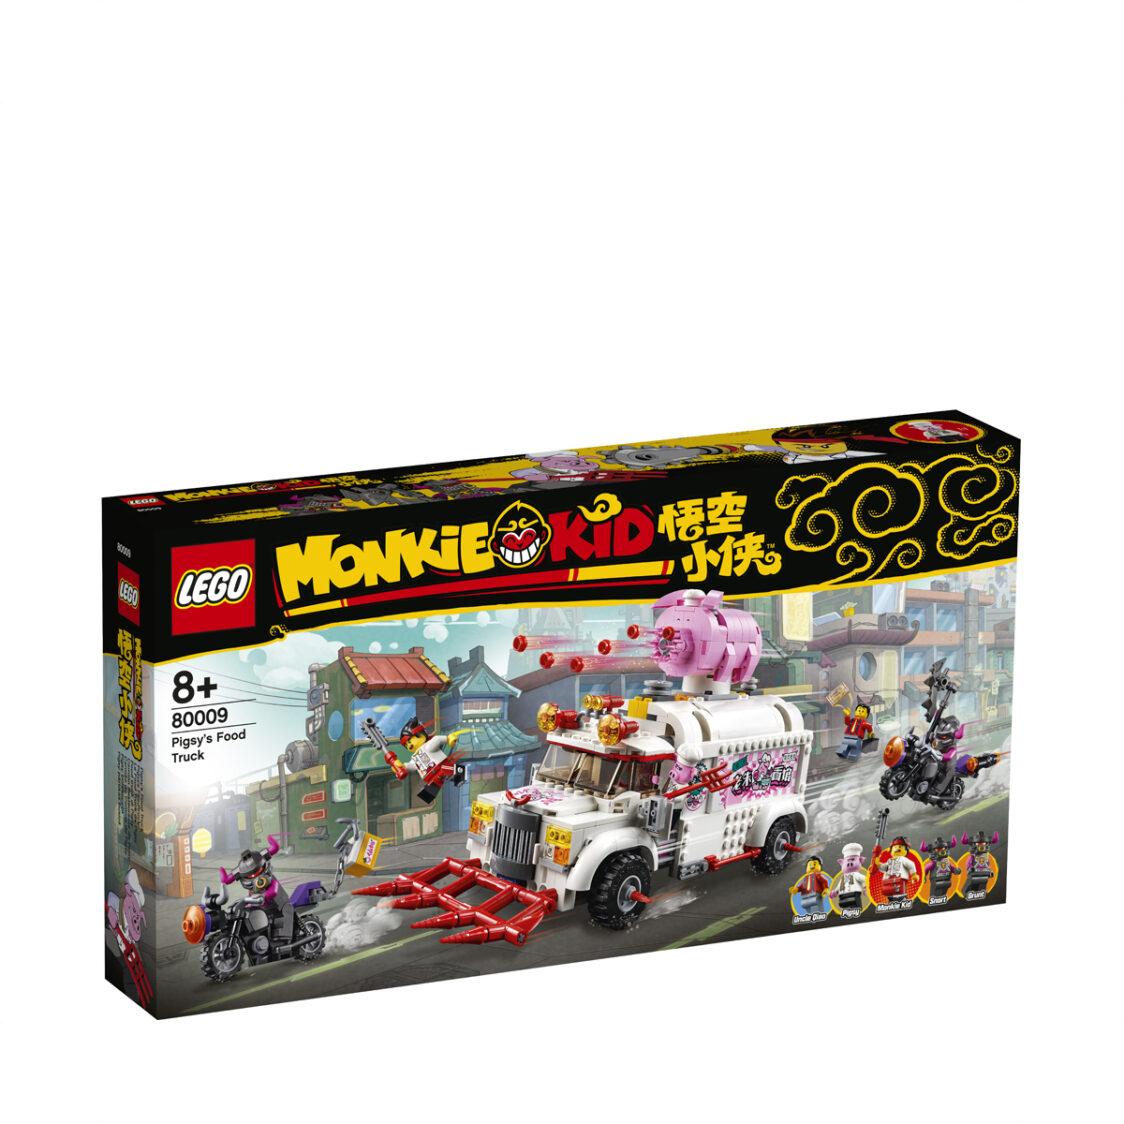 LEGO Pigsy Food Truck 80009 V29